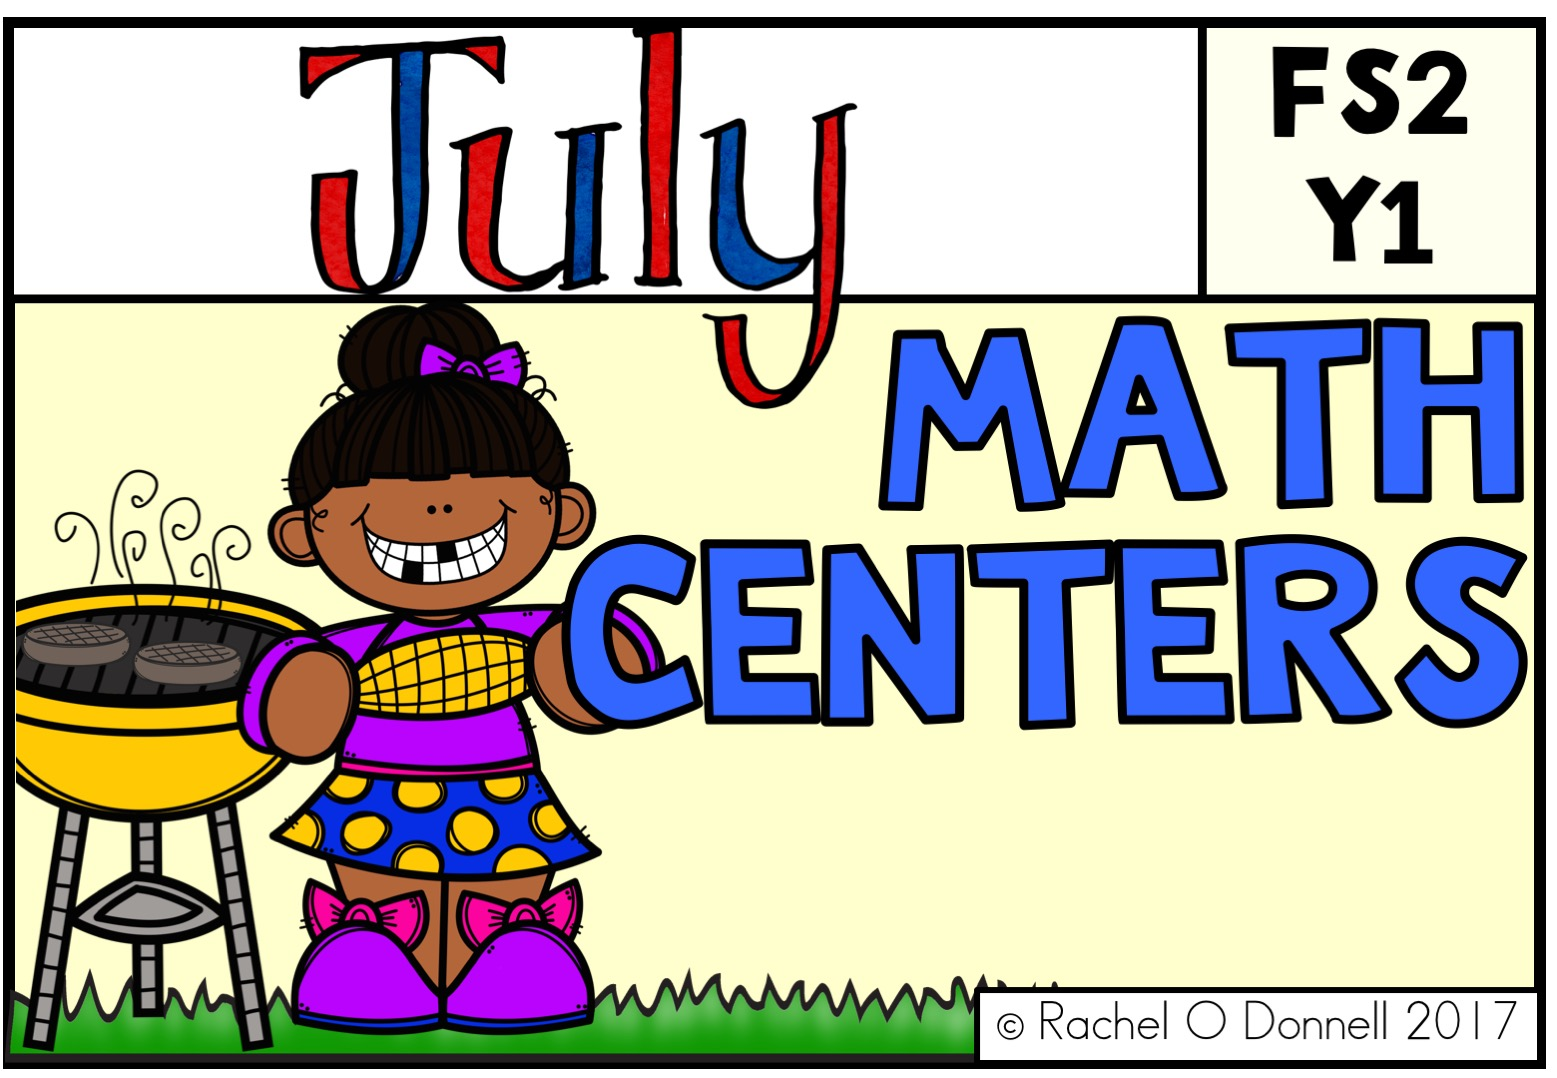 July Maths Centers FS2 Year 1